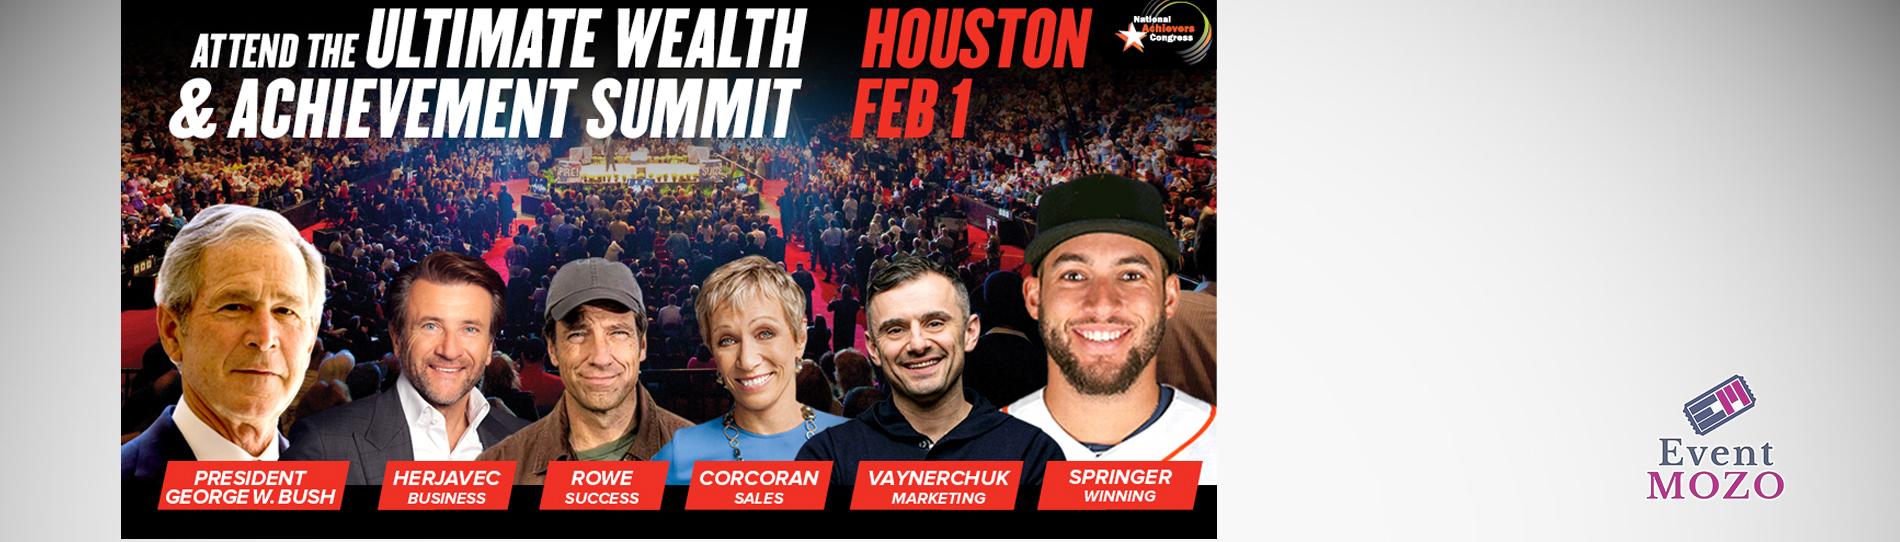 EventMozo Barbara Corcoran, Gary Vaynerchuk, Mike Rowe Live! Houston